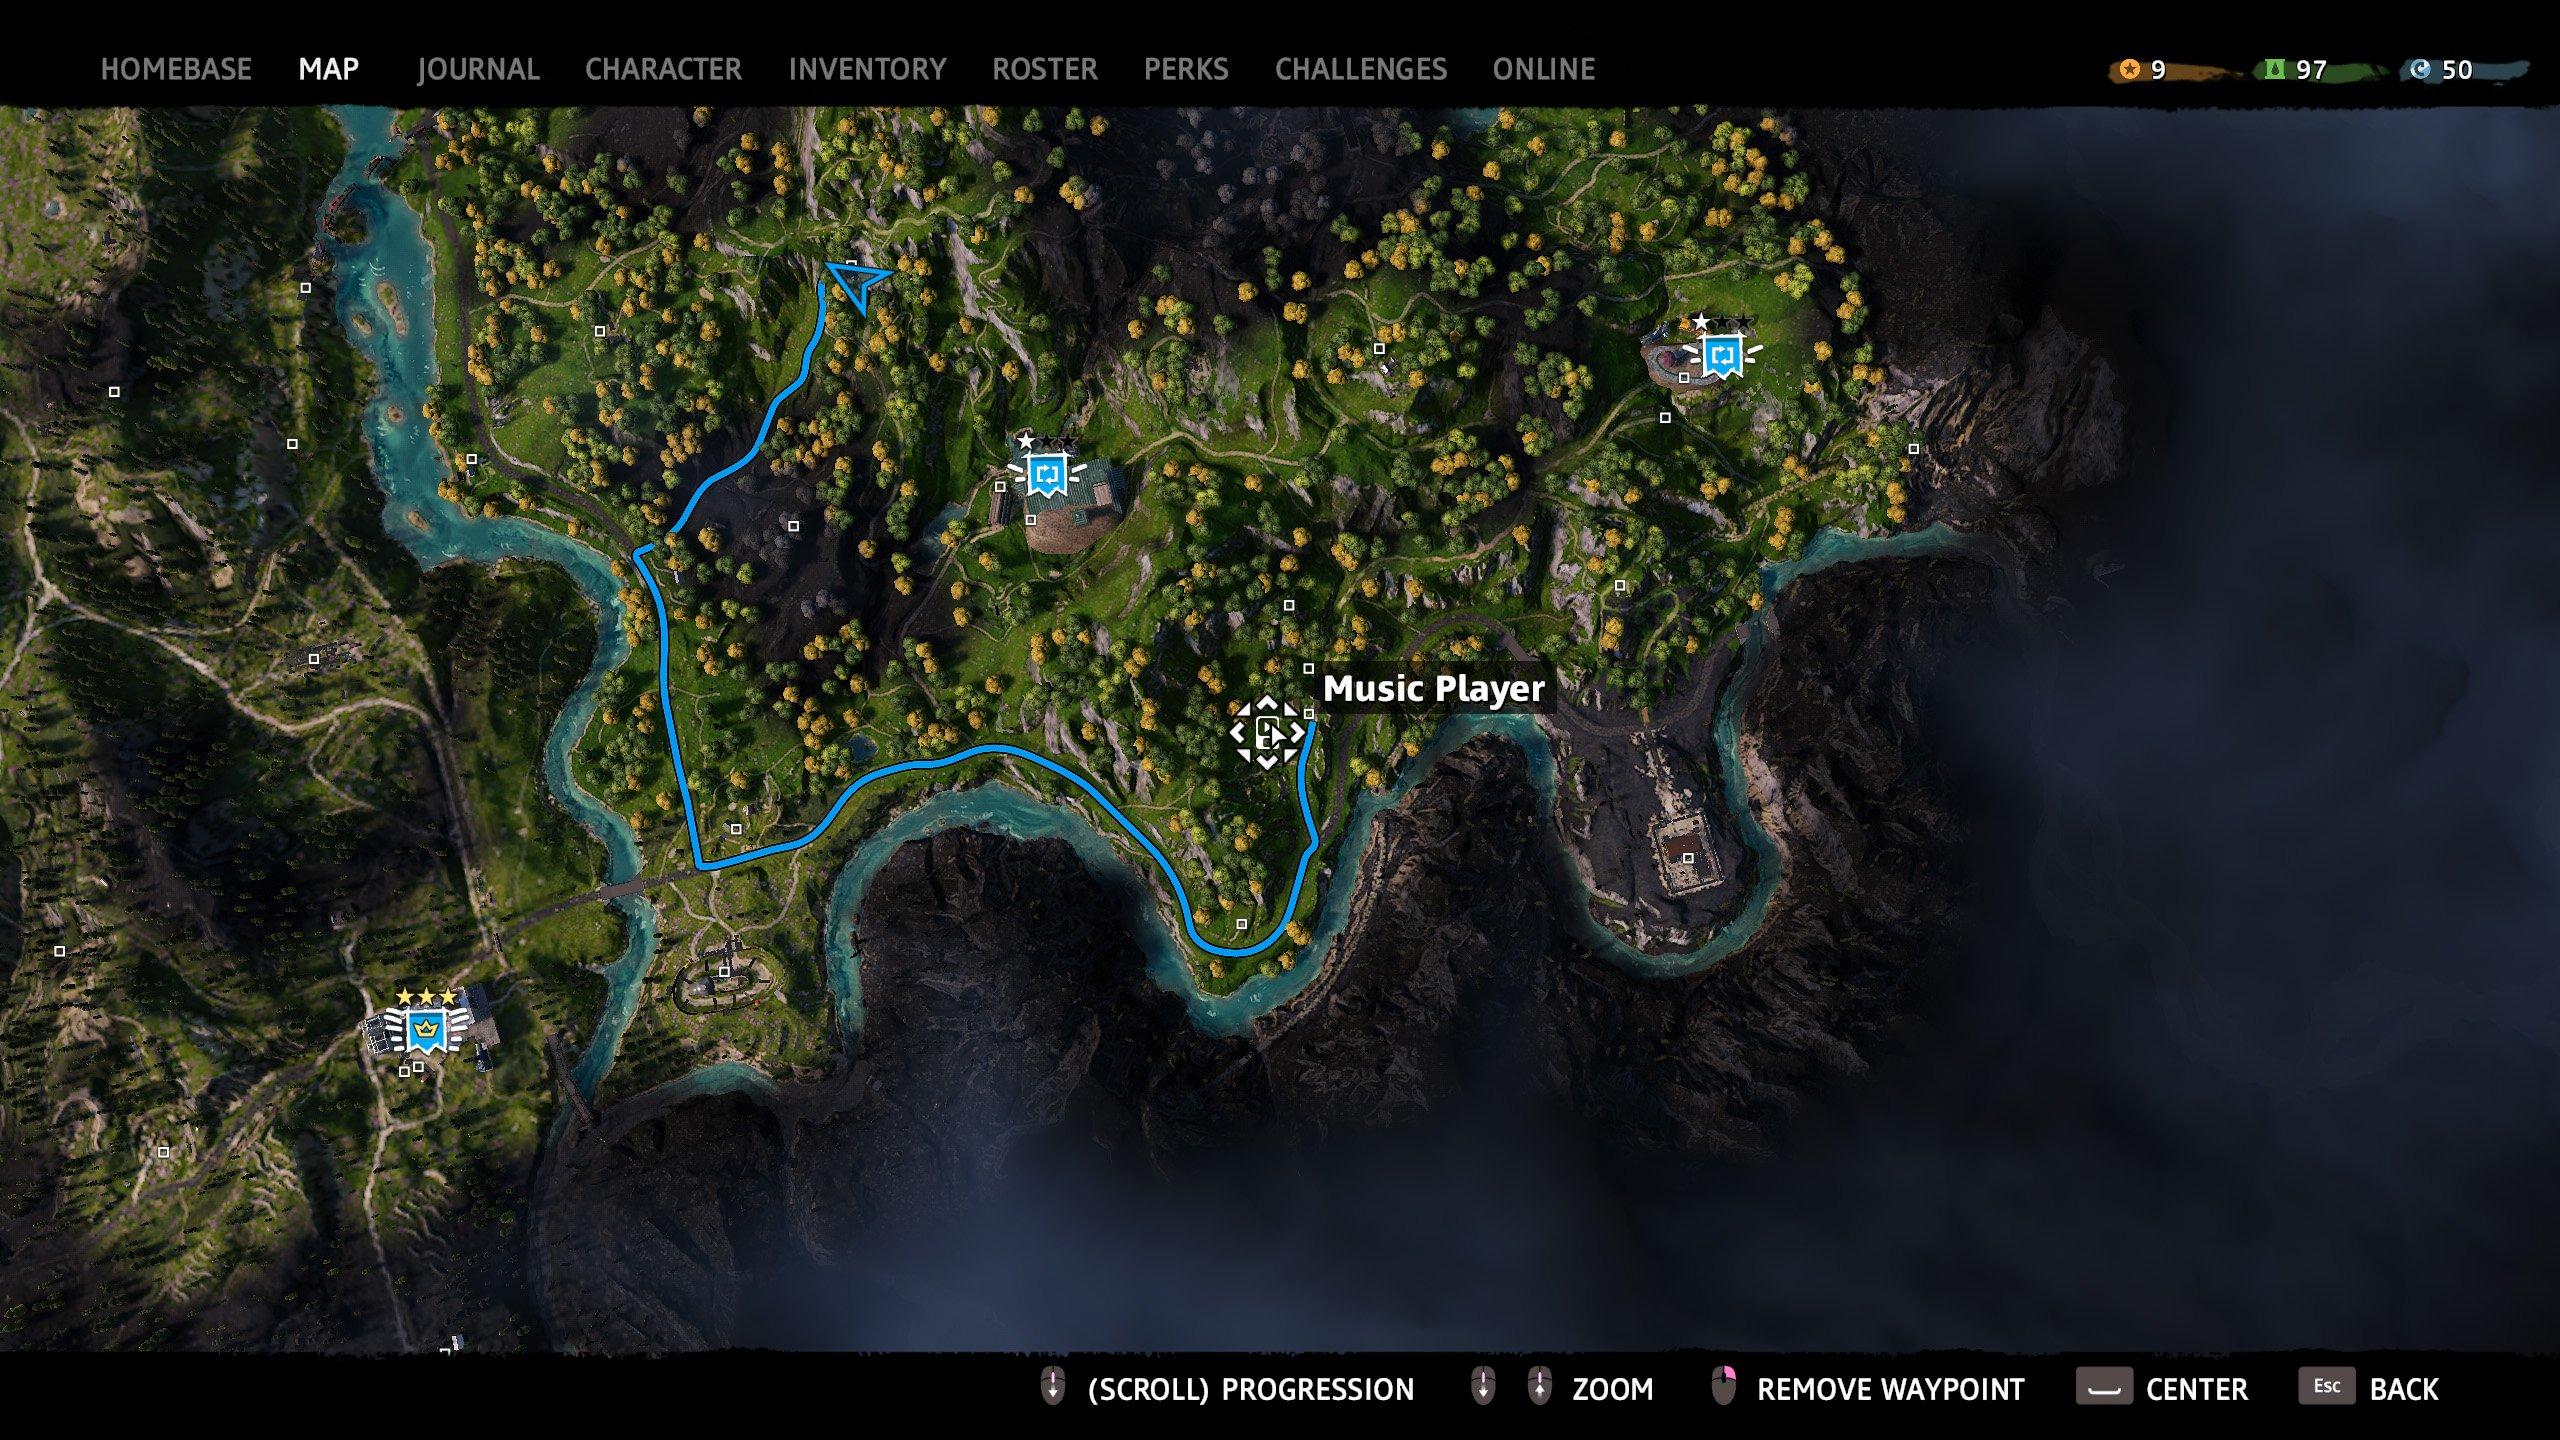 far cry new dawn music player 8 map